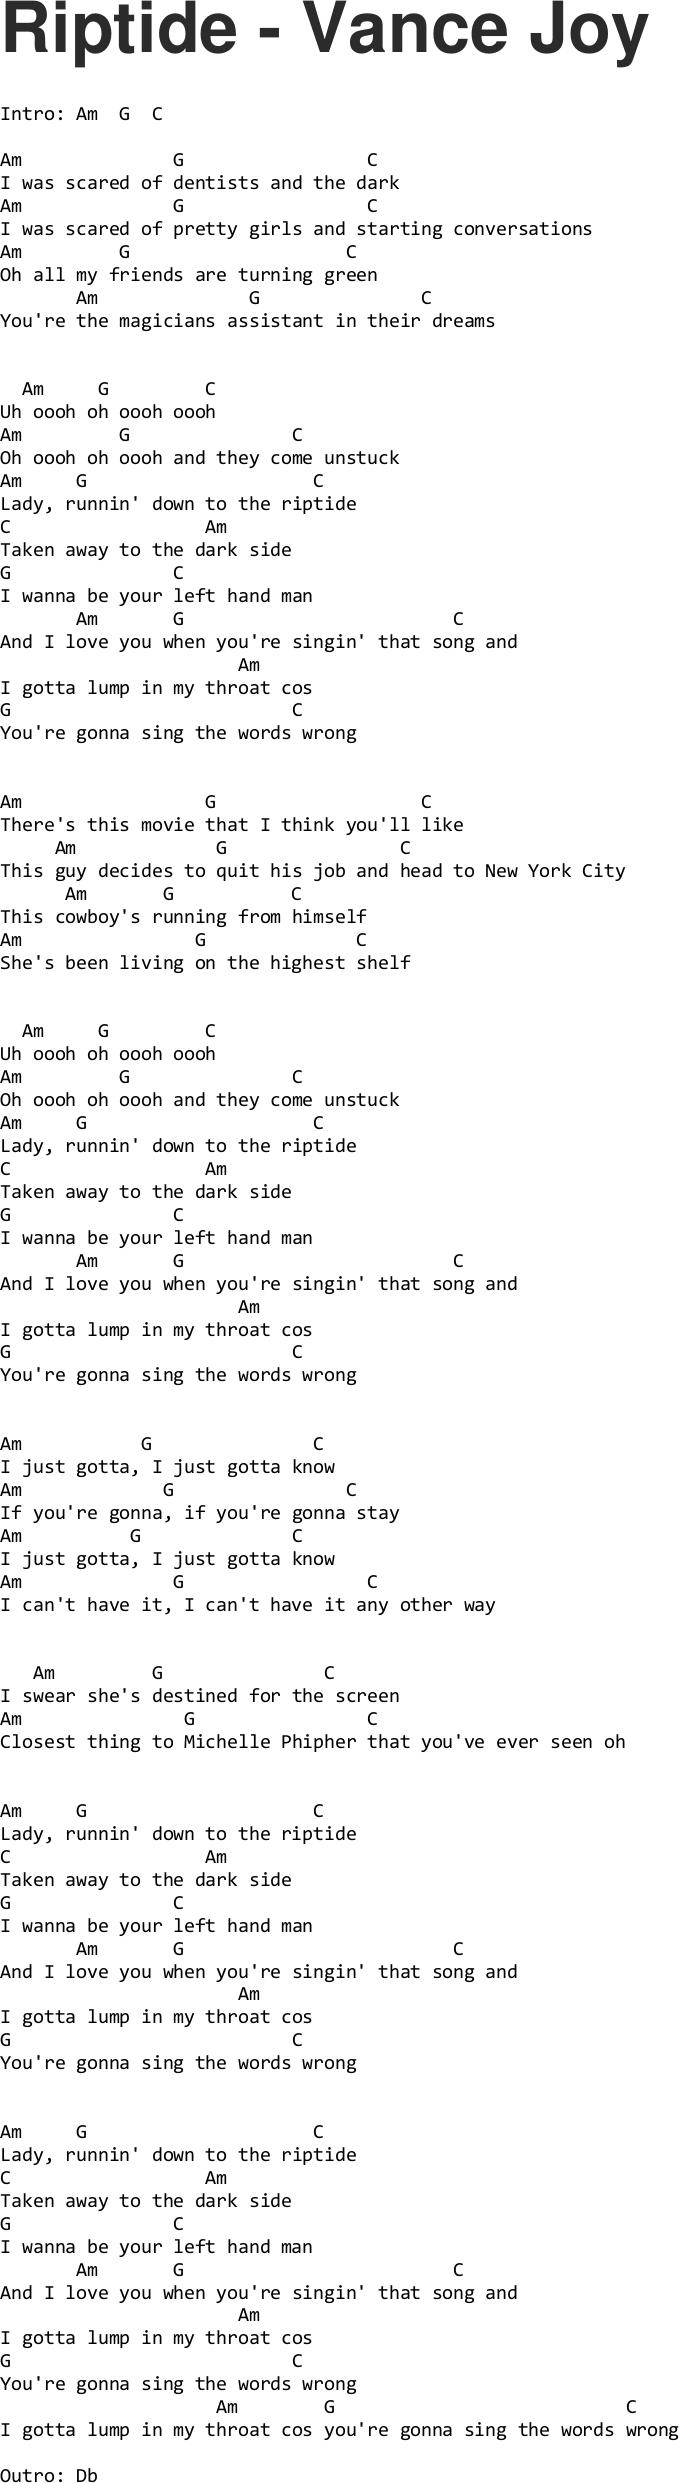 Guitar chords hallelujah leonard cohen